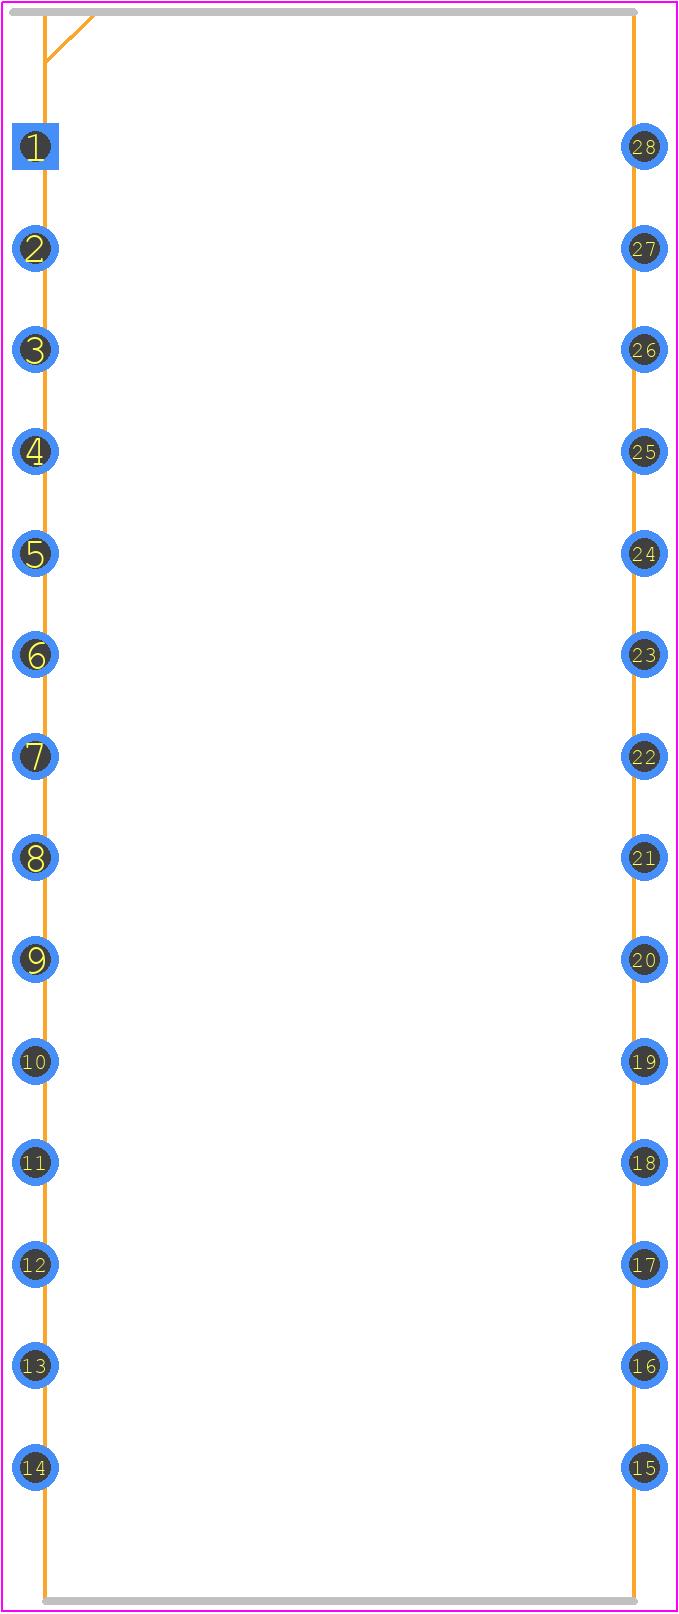 IR2130PBF - Infineon PCB footprint - Dual-In-Line Packages - 28-Lead PDIP (wide body)